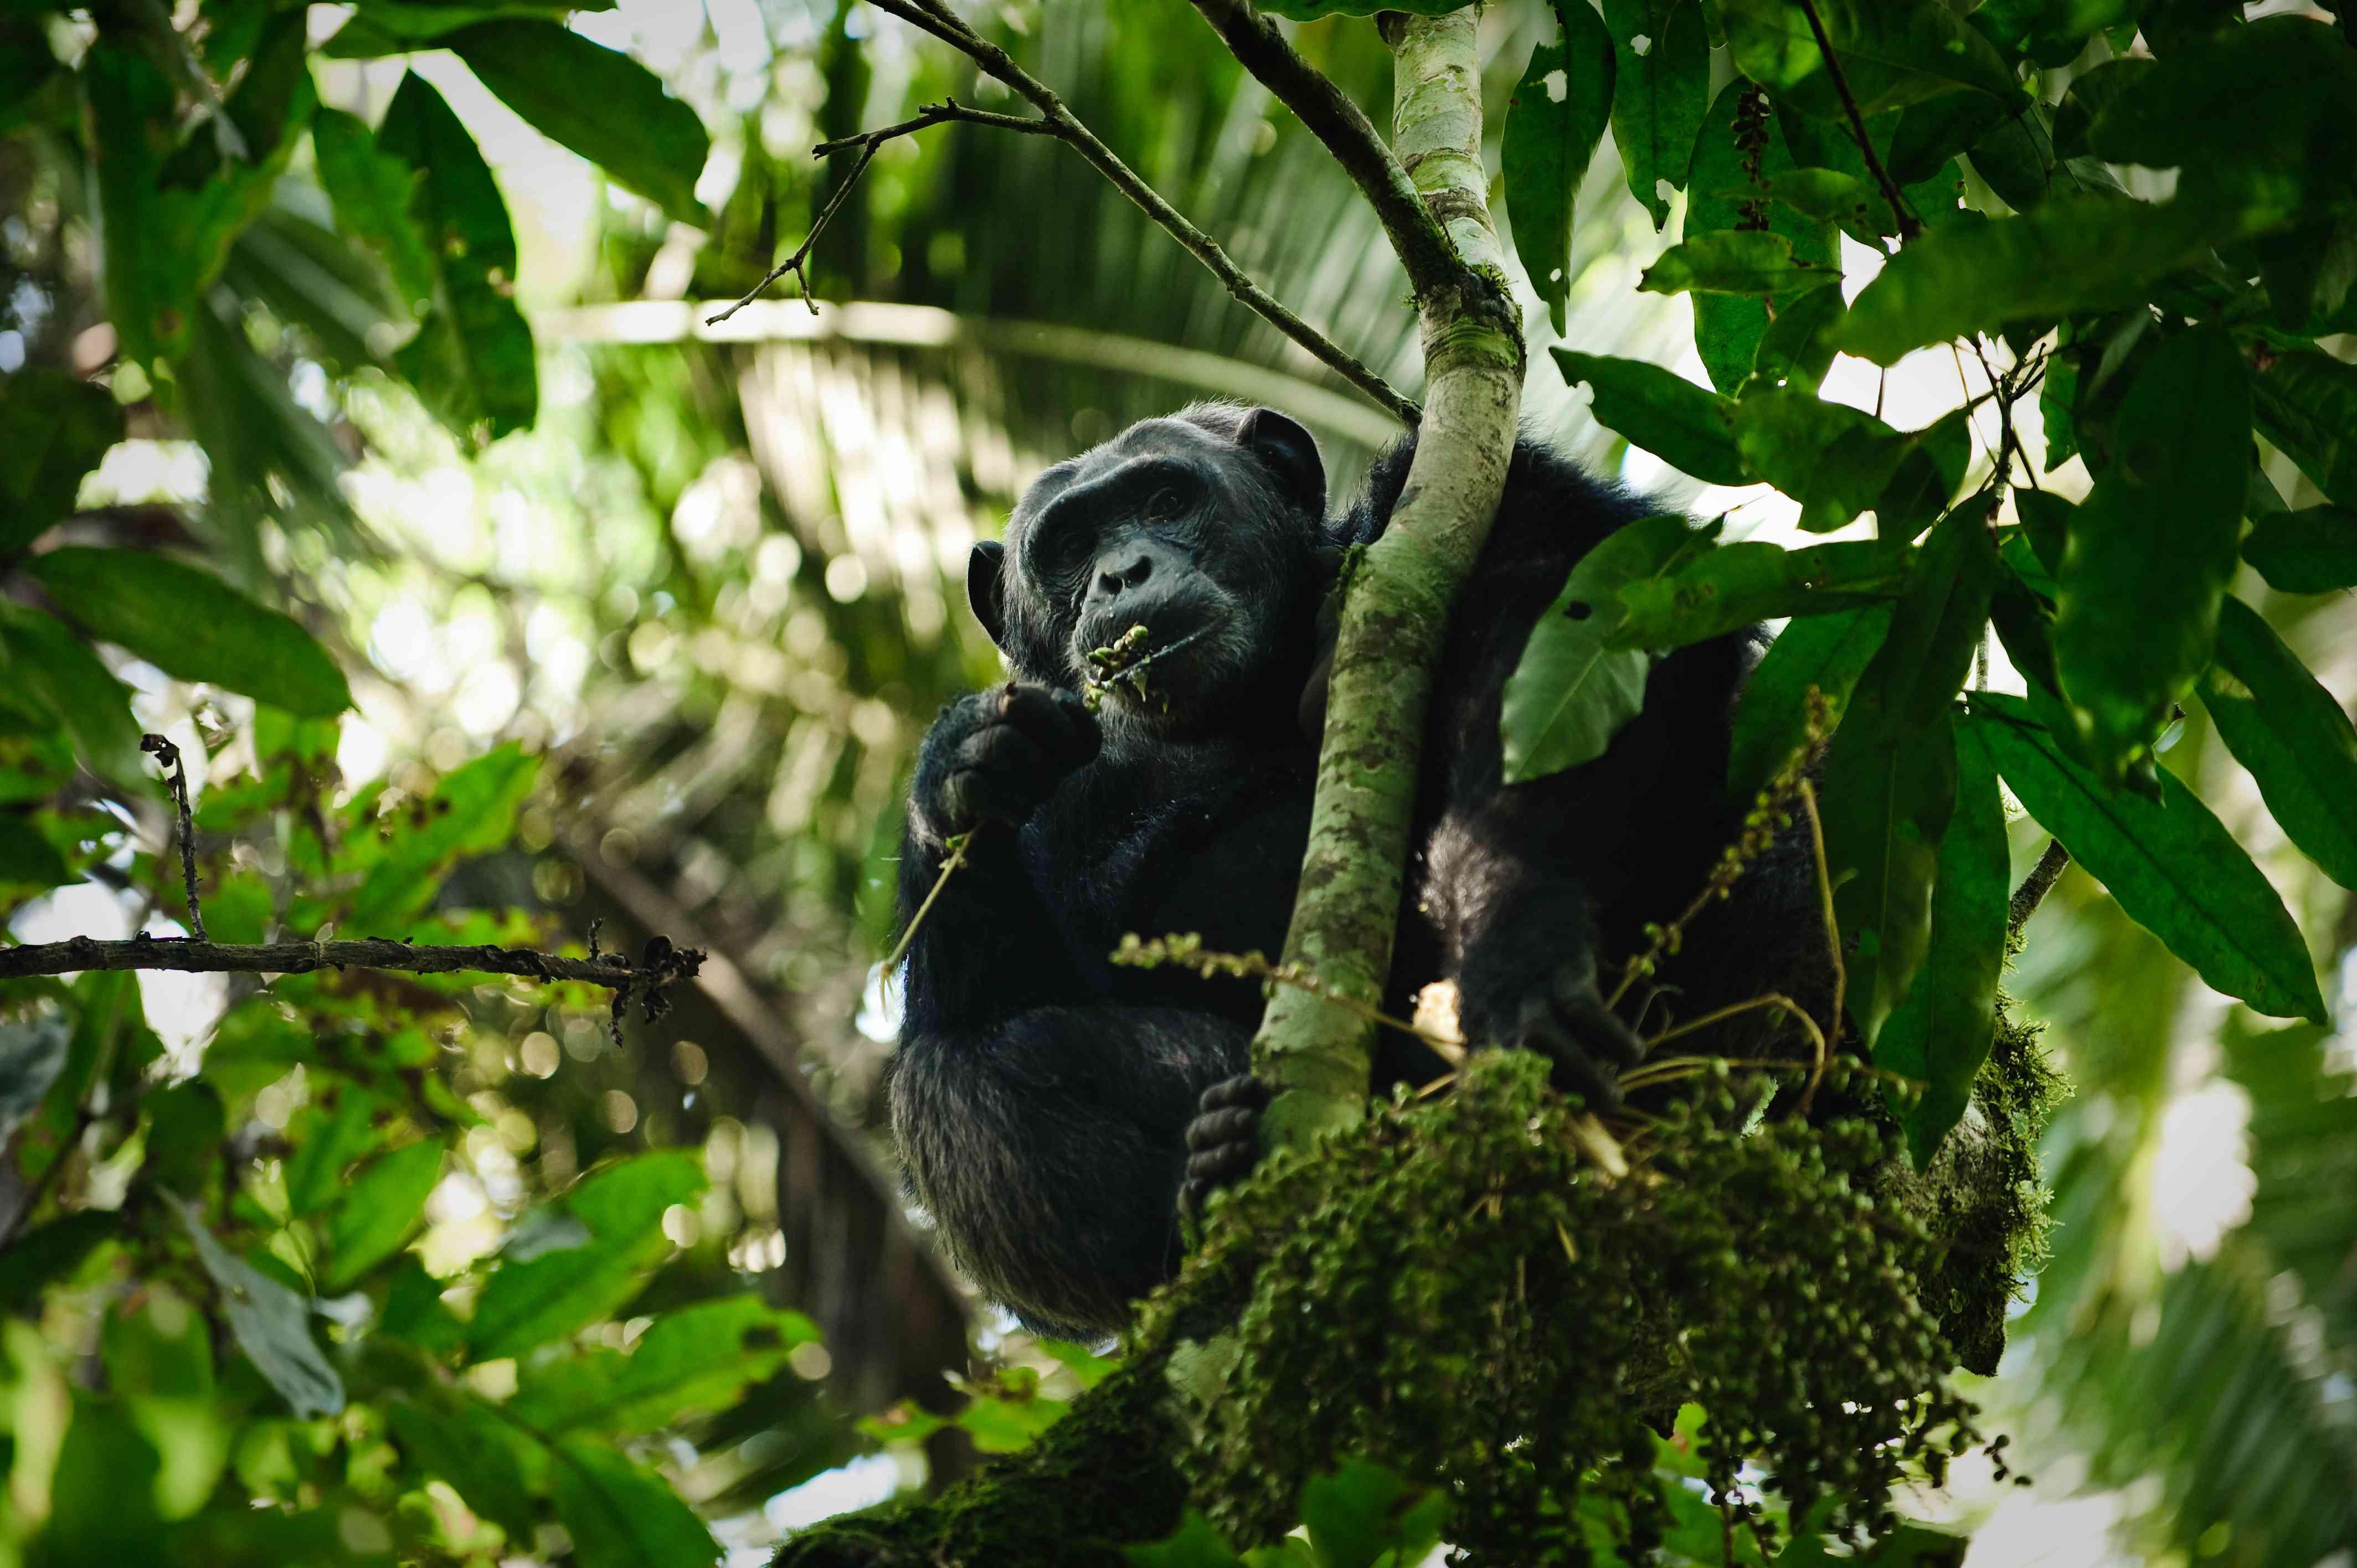 Male chimpanzee (Pan troglodytes), Kibale Forest National Park, Uganda